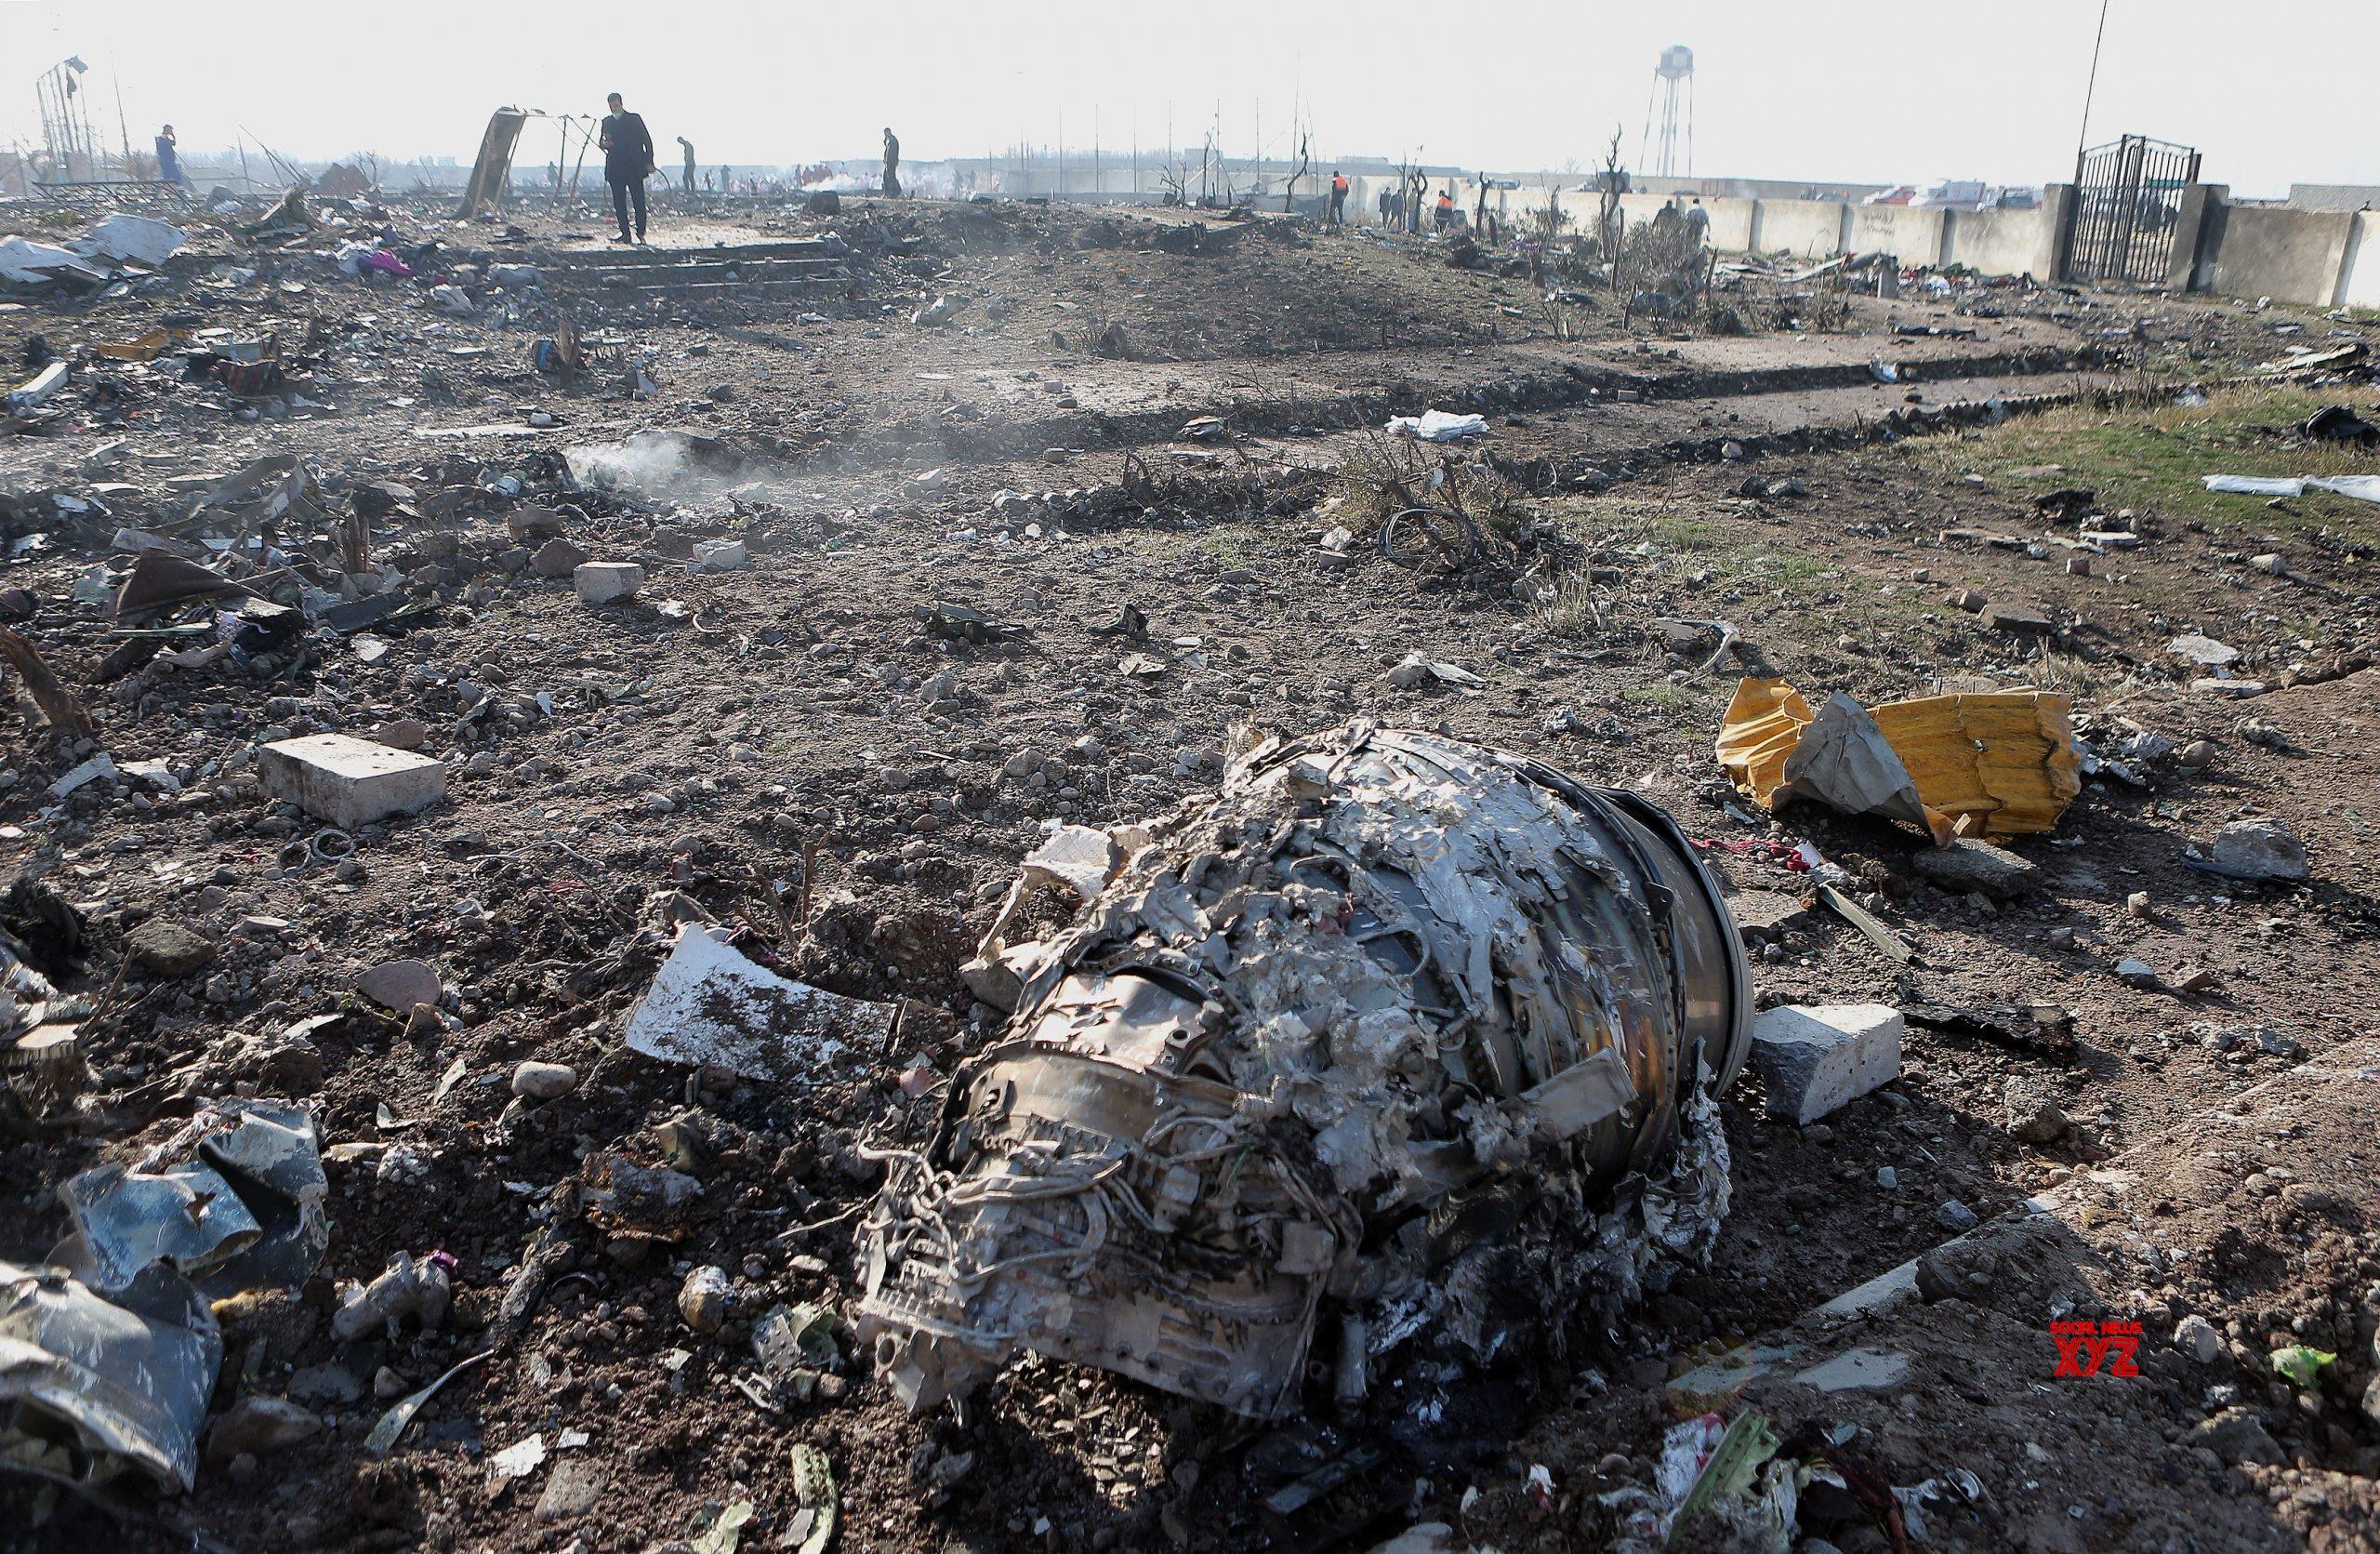 Iran, Ukraine to hold talks over crashed plane